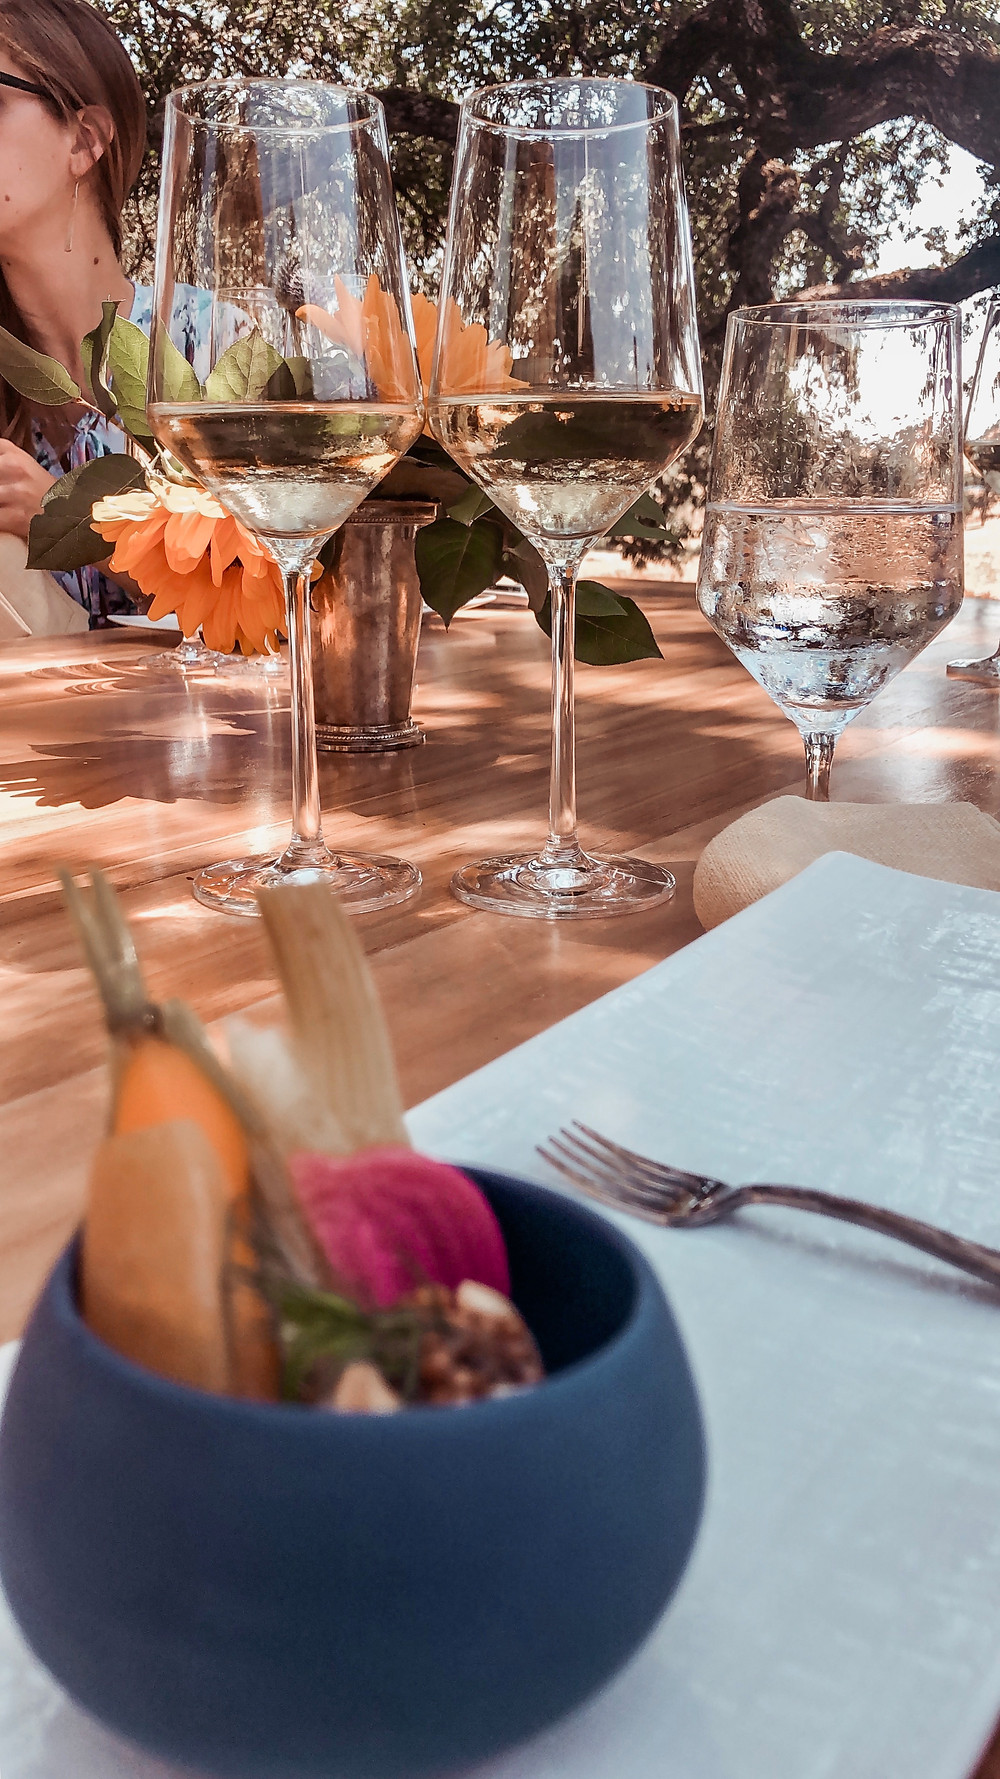 Sonoma Grape Girl, Audra Tavelli, alexander valley, experience alexander valley, sonoma county, sonoma county wine event, healdsburg event, healdsburg wine event, sonoma county blogger, alexander valley wine tasting, alexander valley wineries, jordan winery